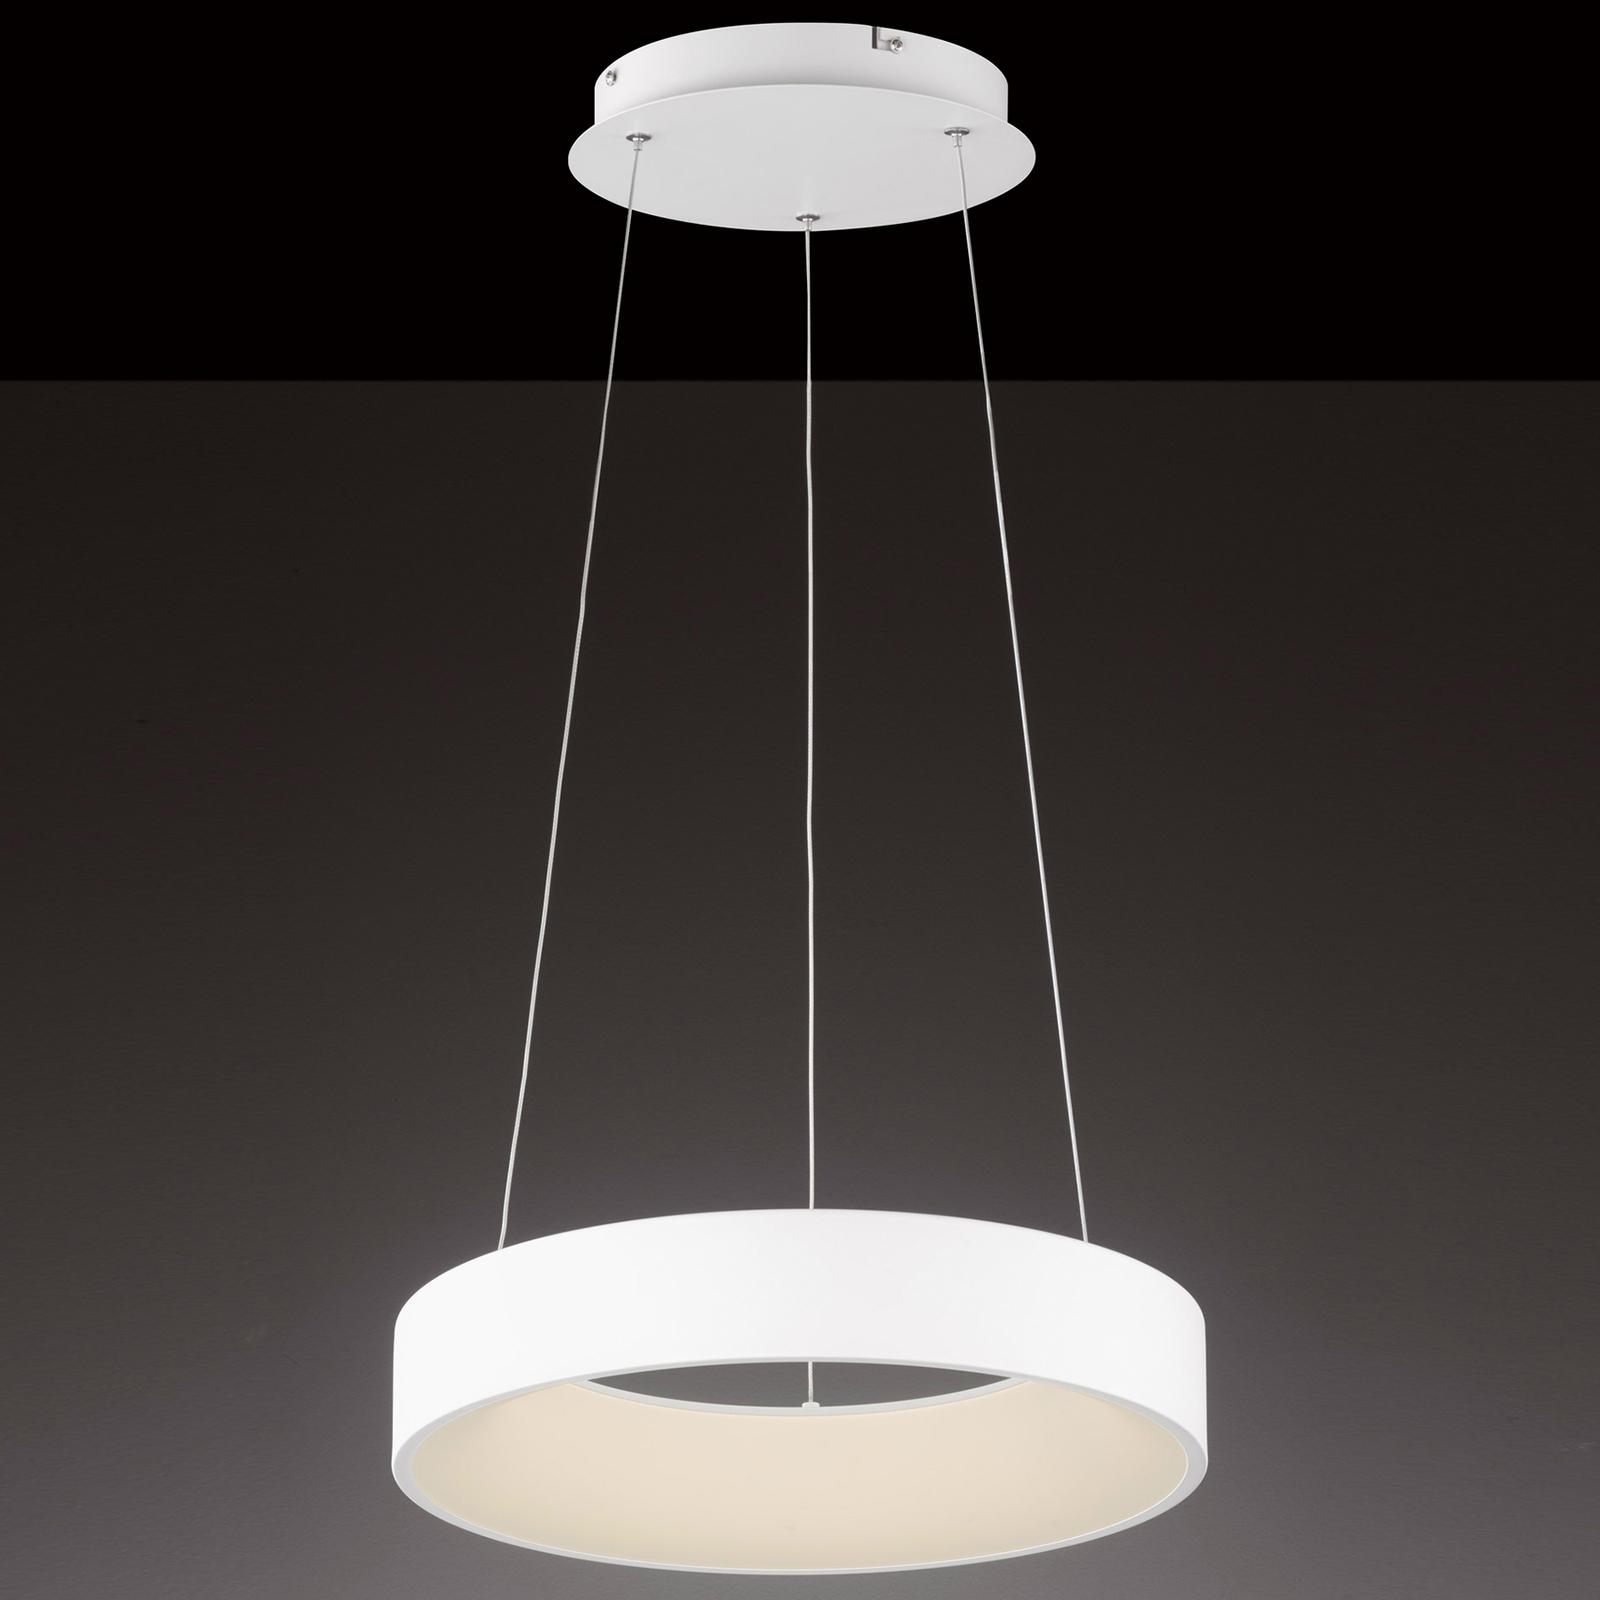 Lampa wisząca LED Cameron z pilotem, 45 cm